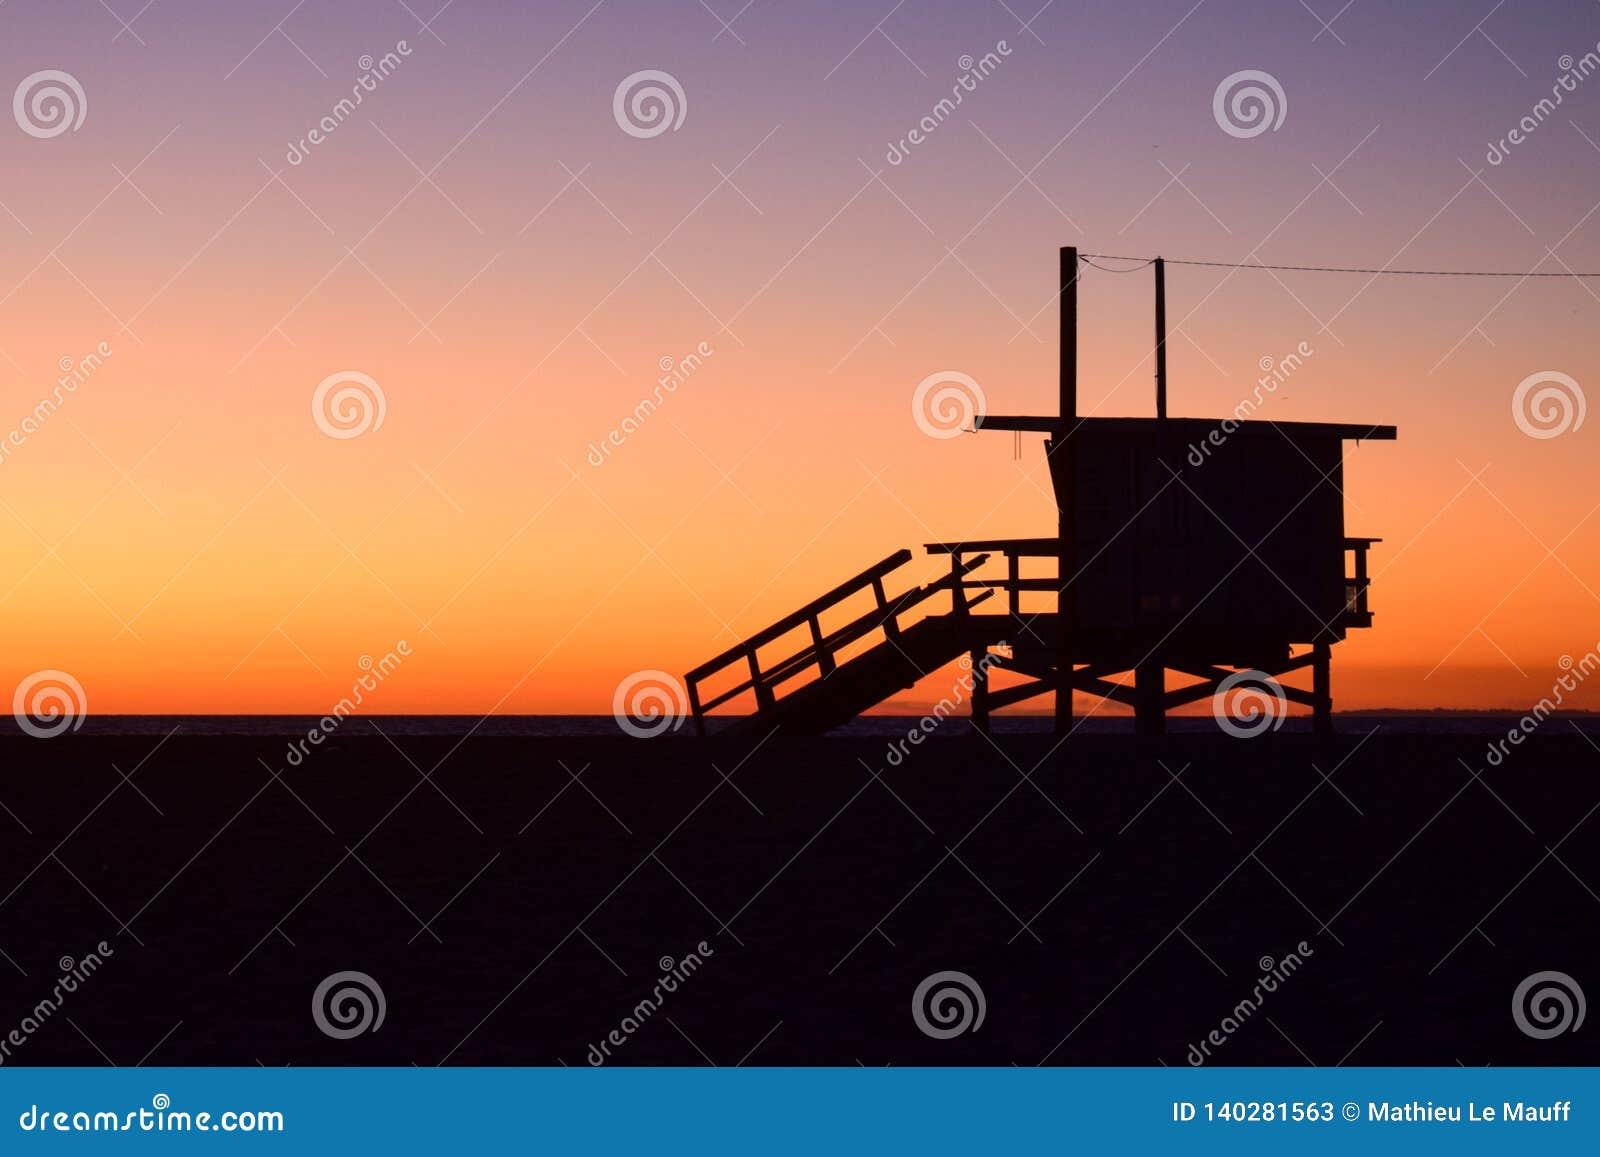 Sunset over USA Beach and Lifeguard Tower in Santa Monica, California